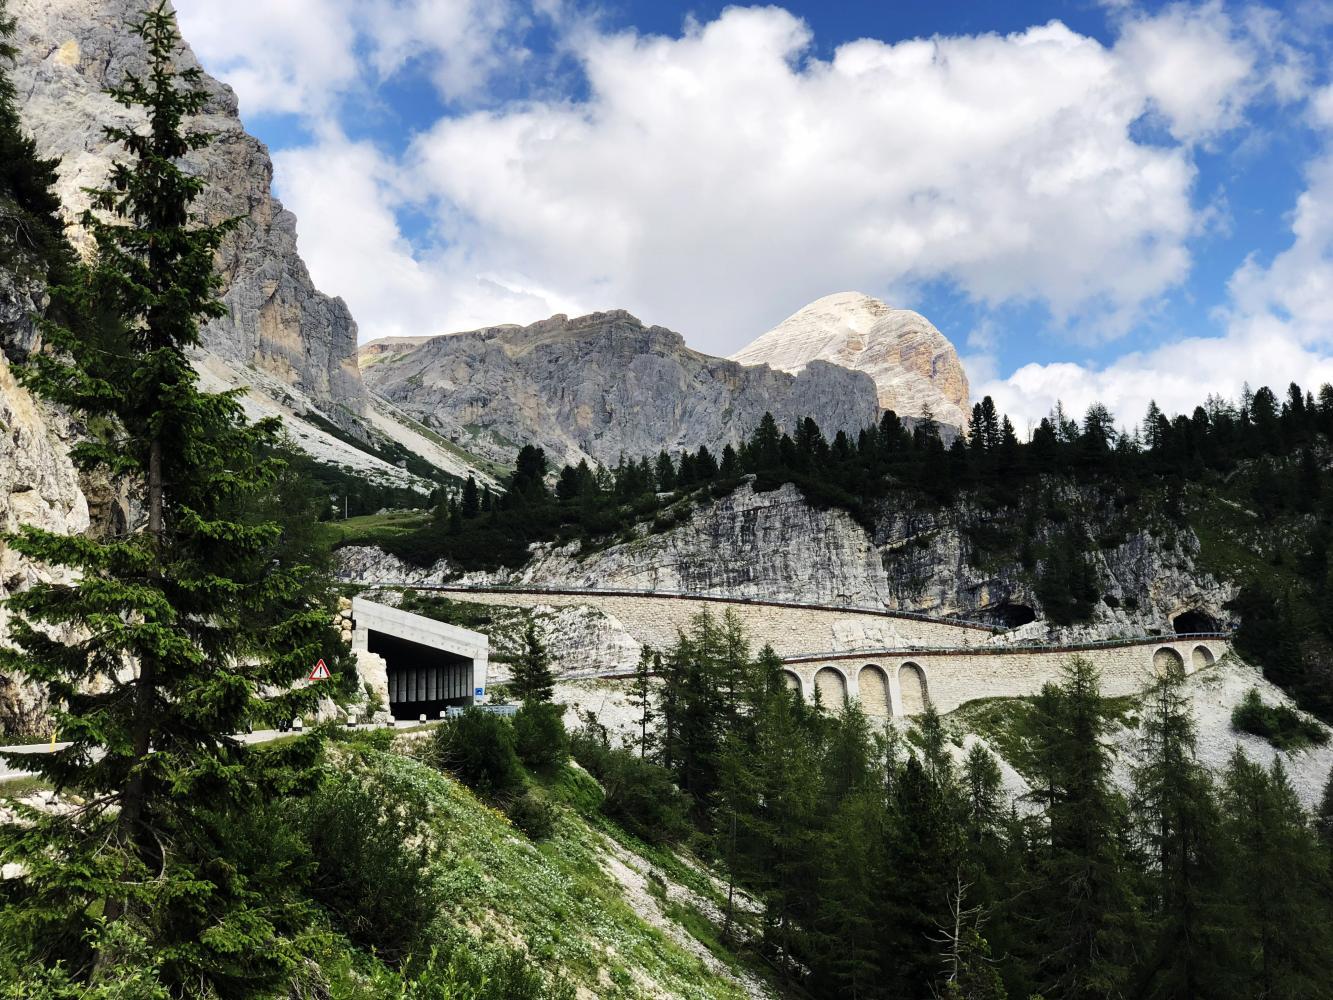 Passo Falzarego - Caprile Bike Climb - PJAMM Cycling